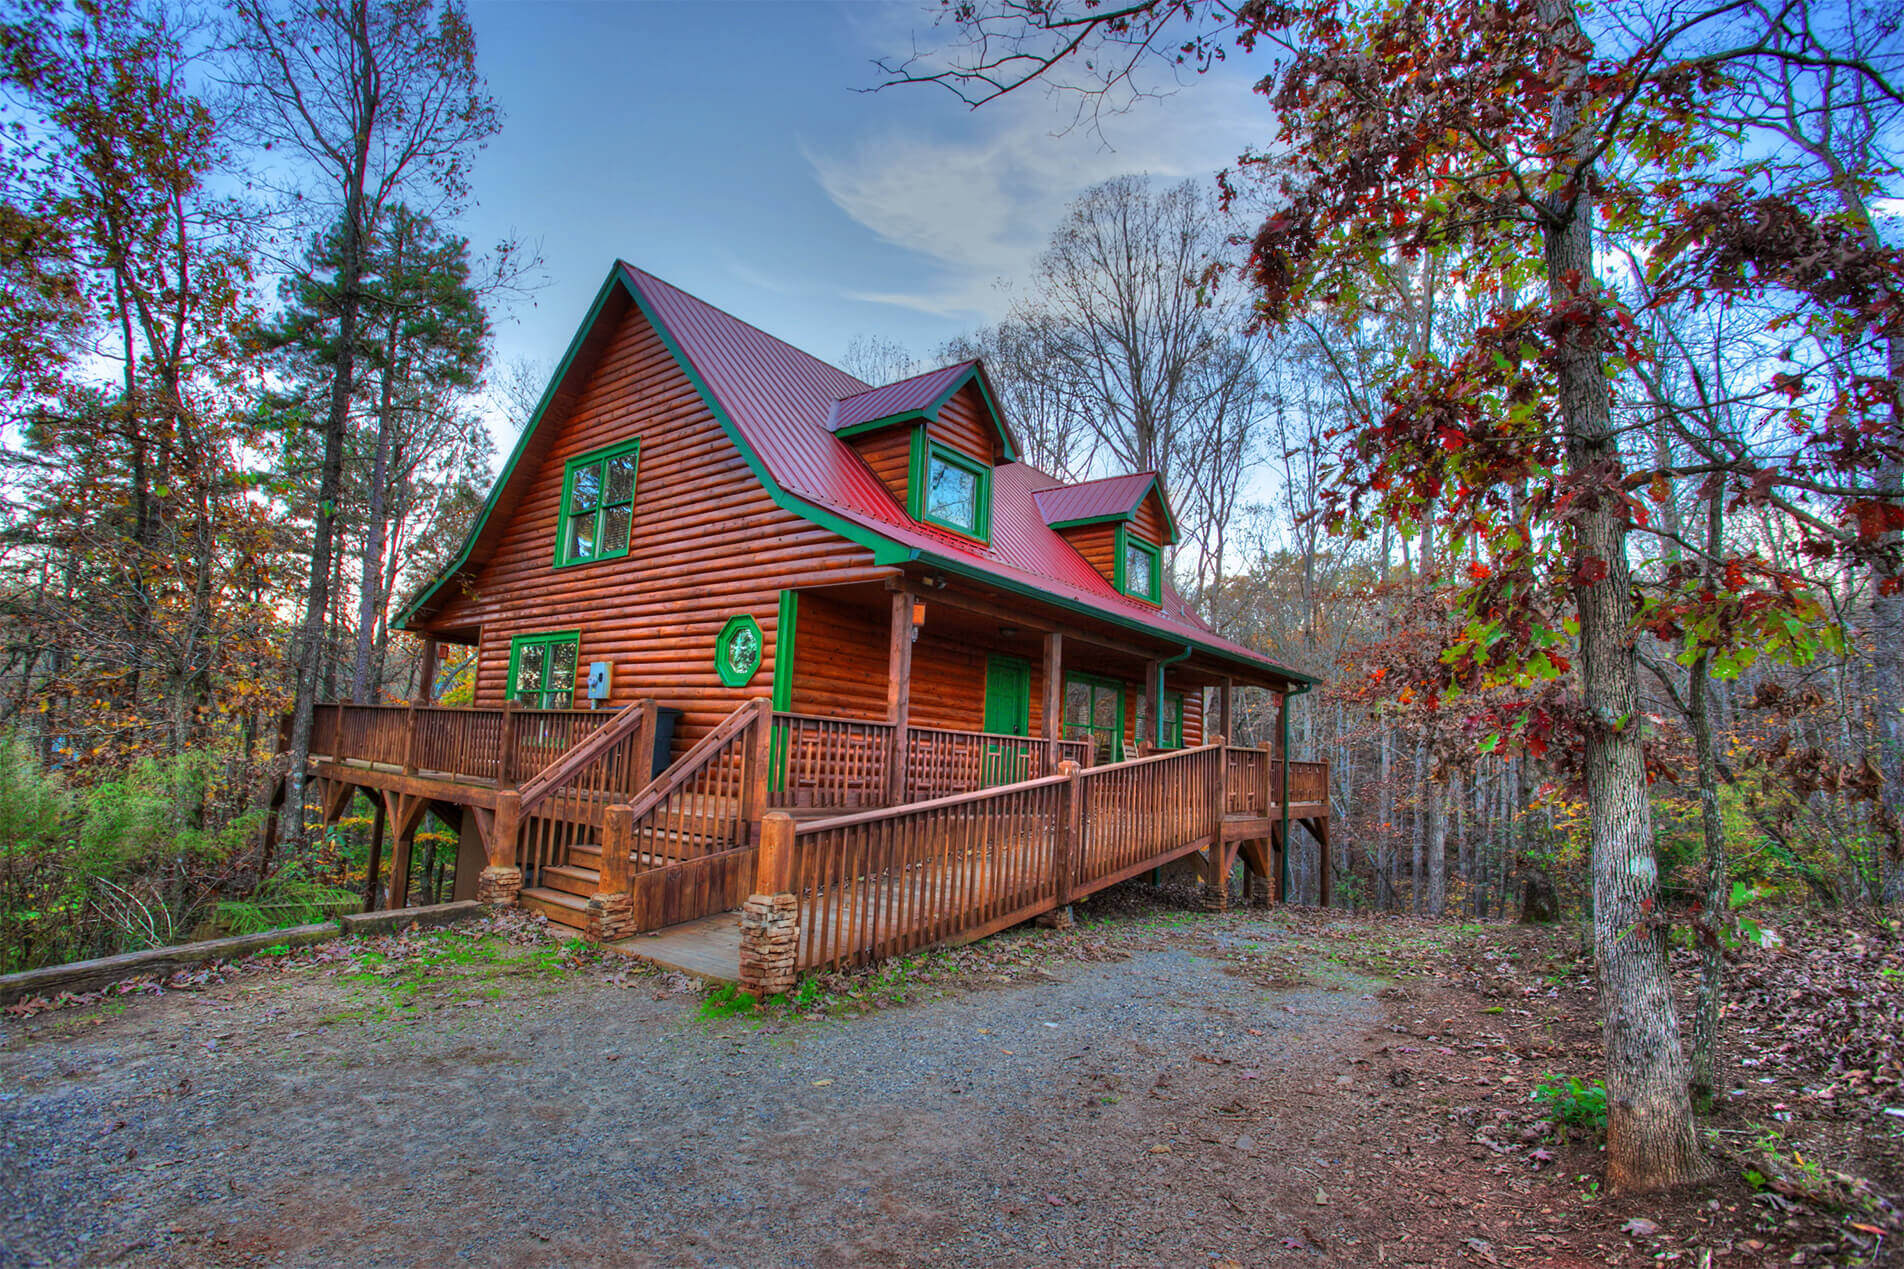 Whispering-Pines-Cedar-Creek-Cabin-Rentals-Helen-Georgia-top-banner-2-tiny